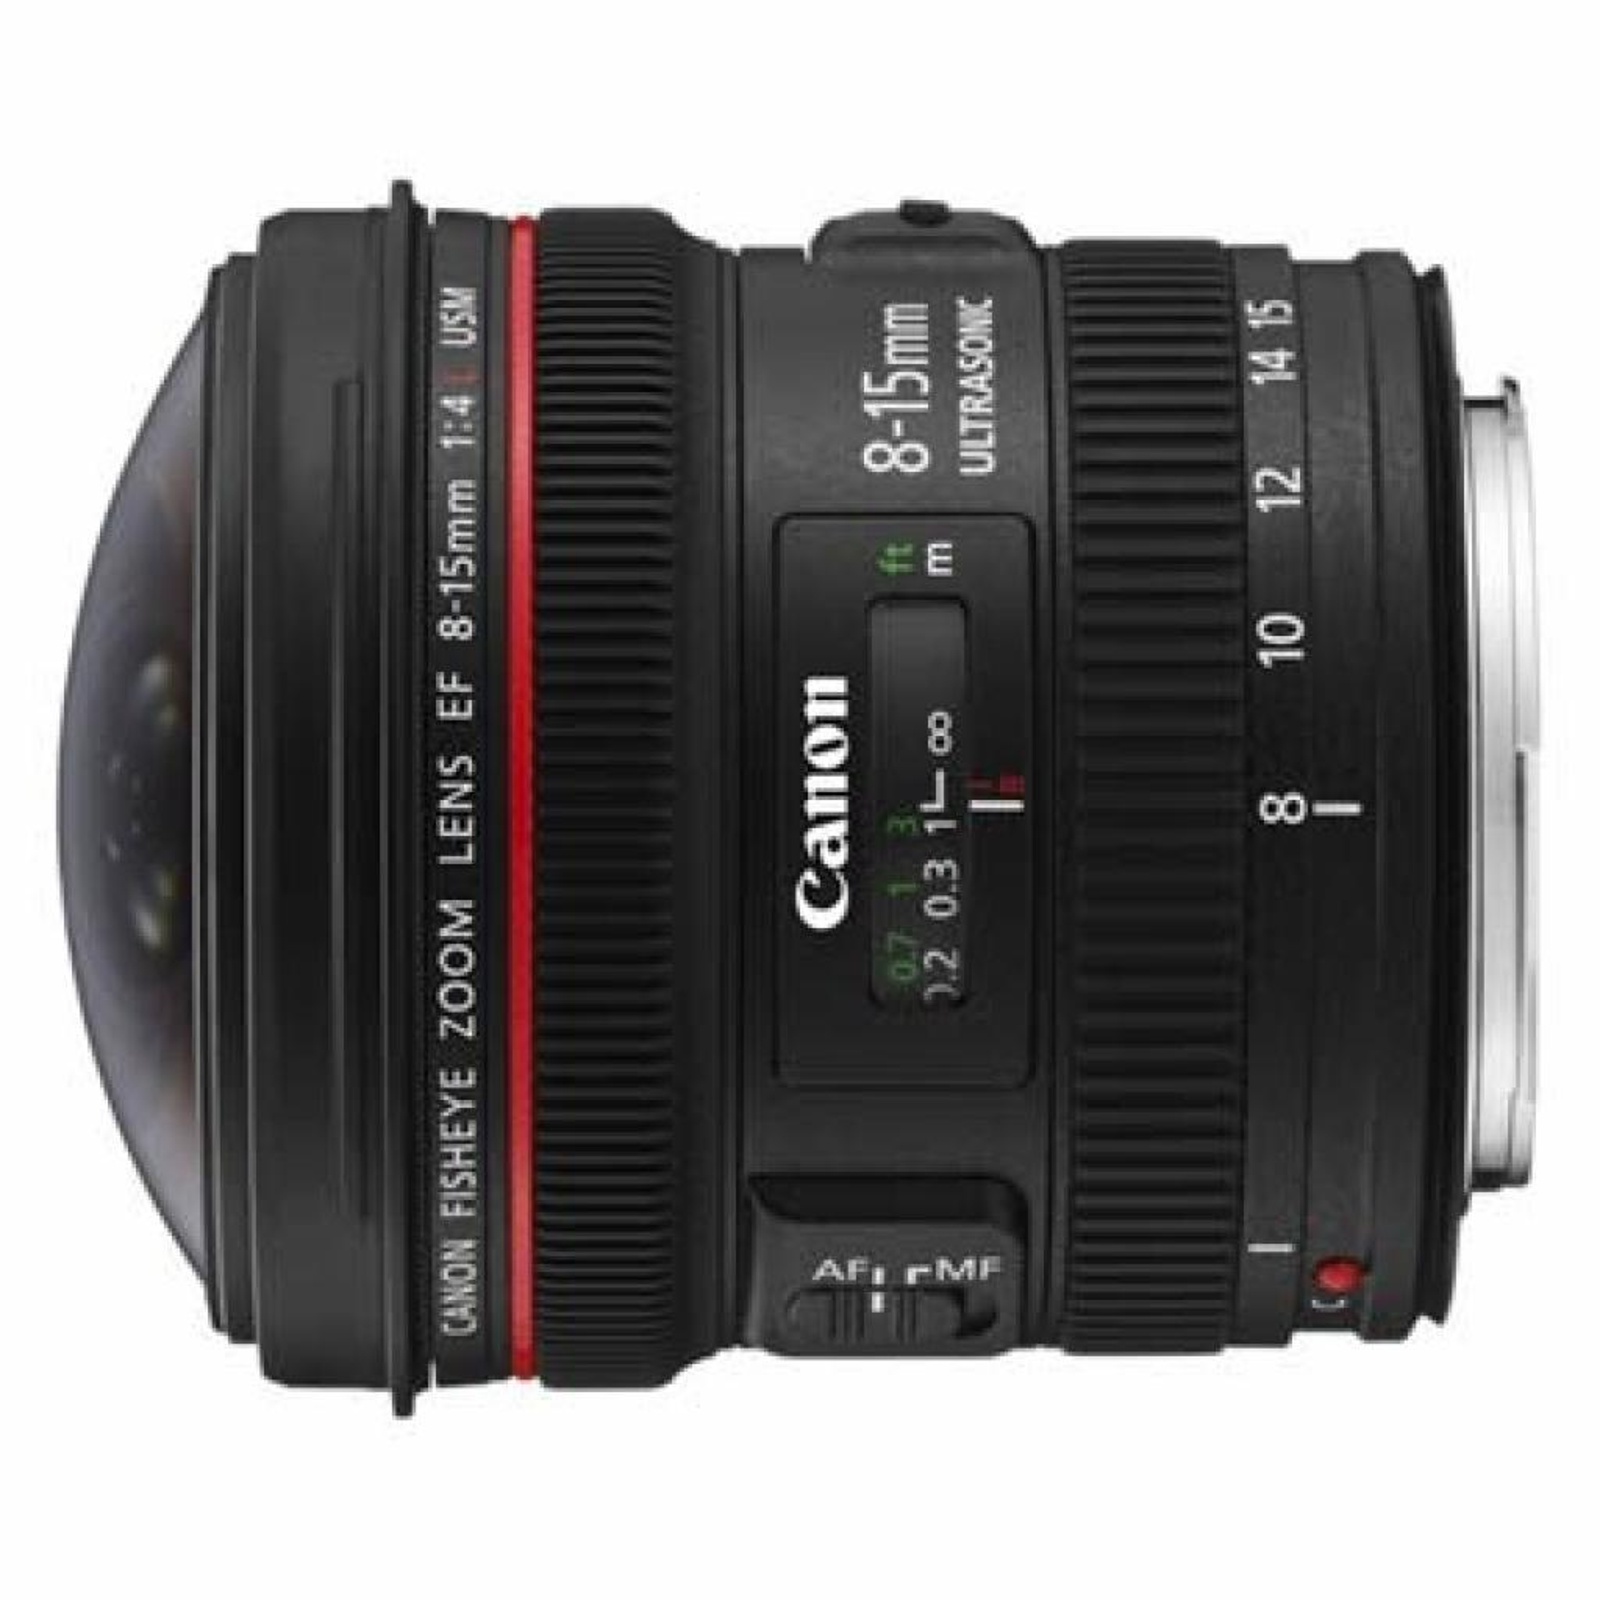 Объектив Canon EF 8-15mm f/4L fisheye USM (4427B005)